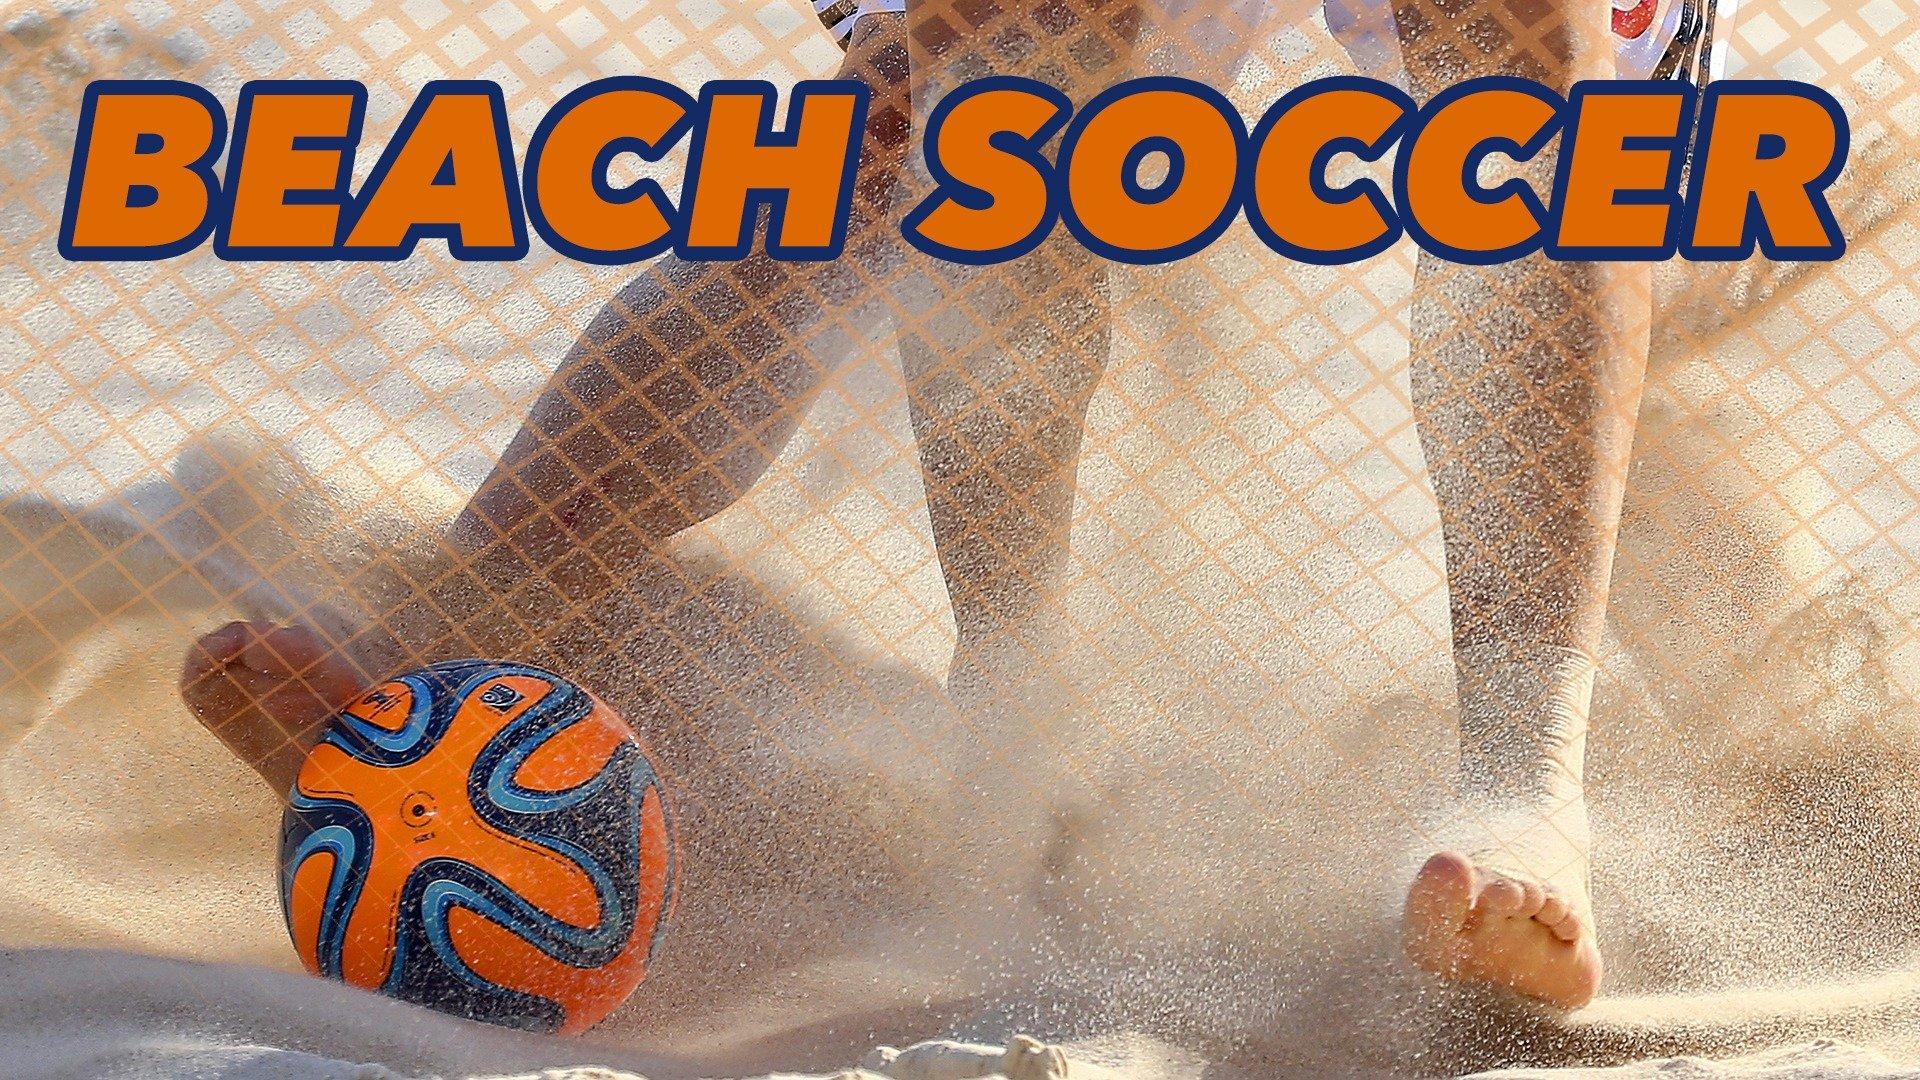 Beach Soccer